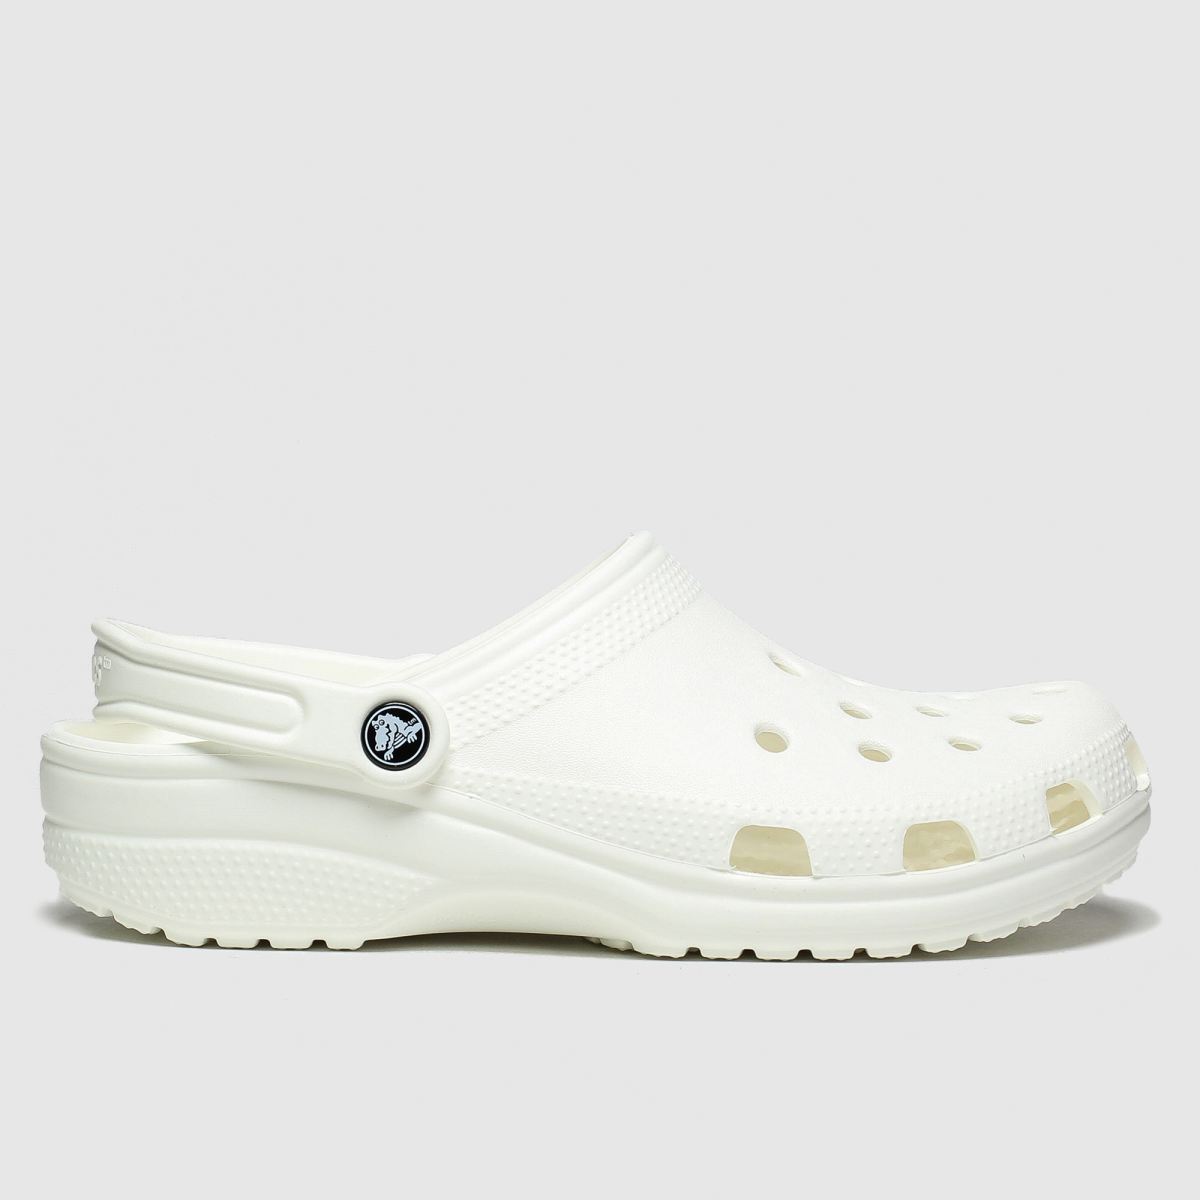 Crocs Crocs White Classic Clog Sandals